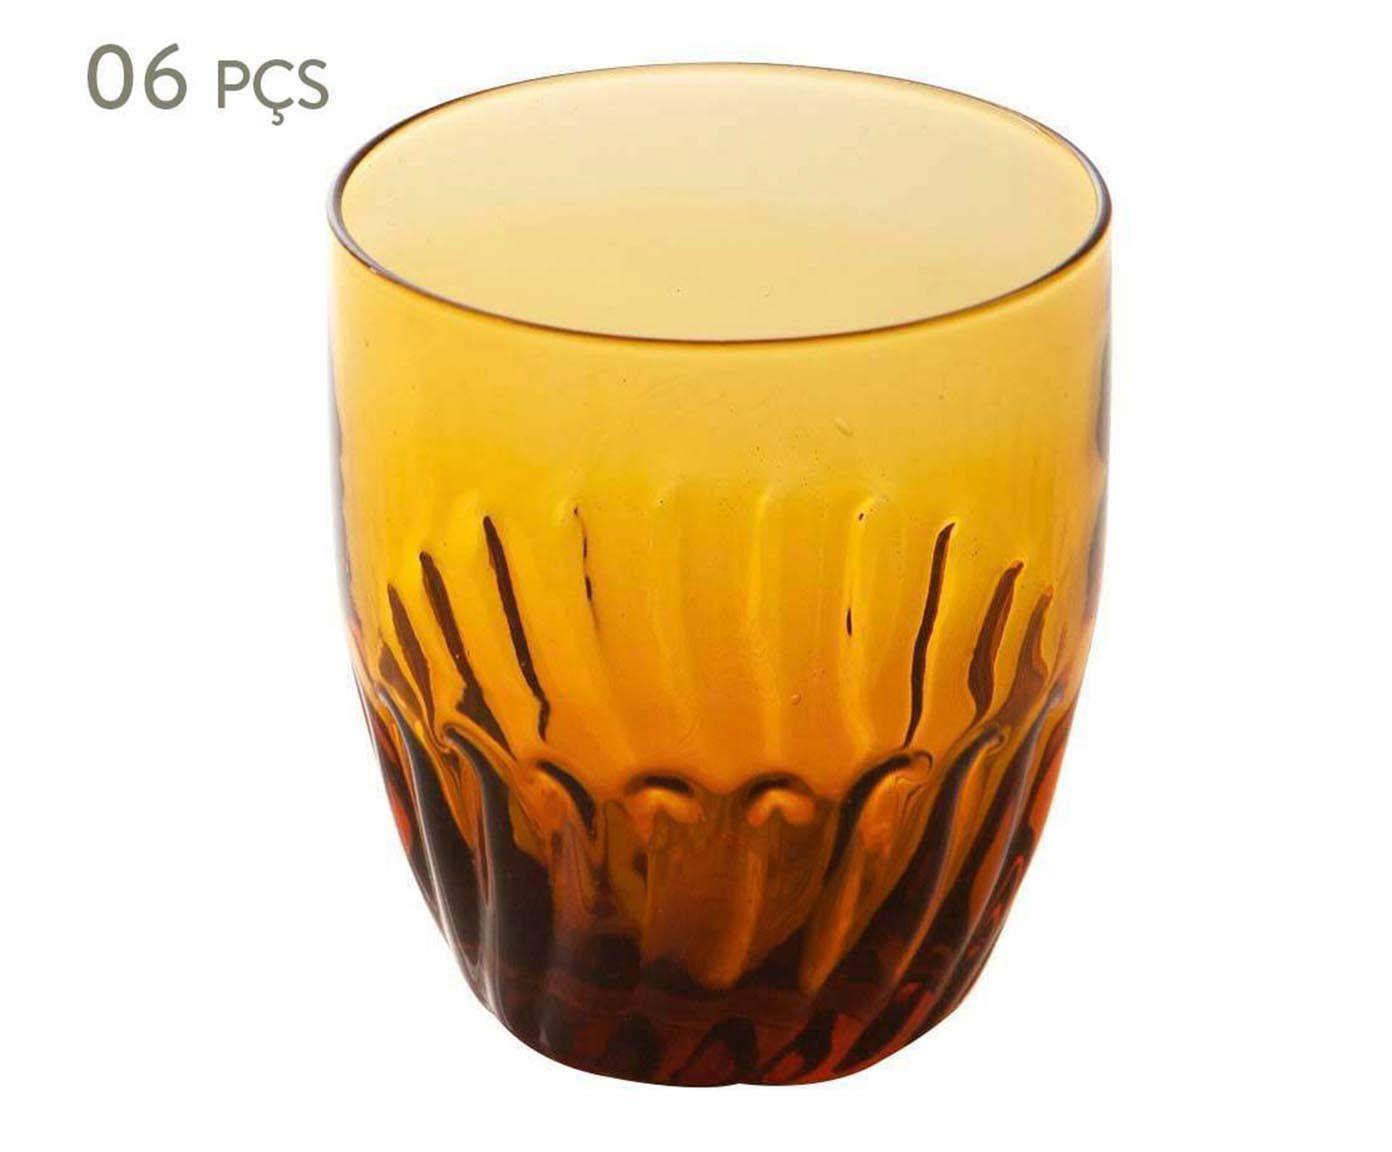 Conjunto de copos para refresco dulcet - 400 ml | Westwing.com.br